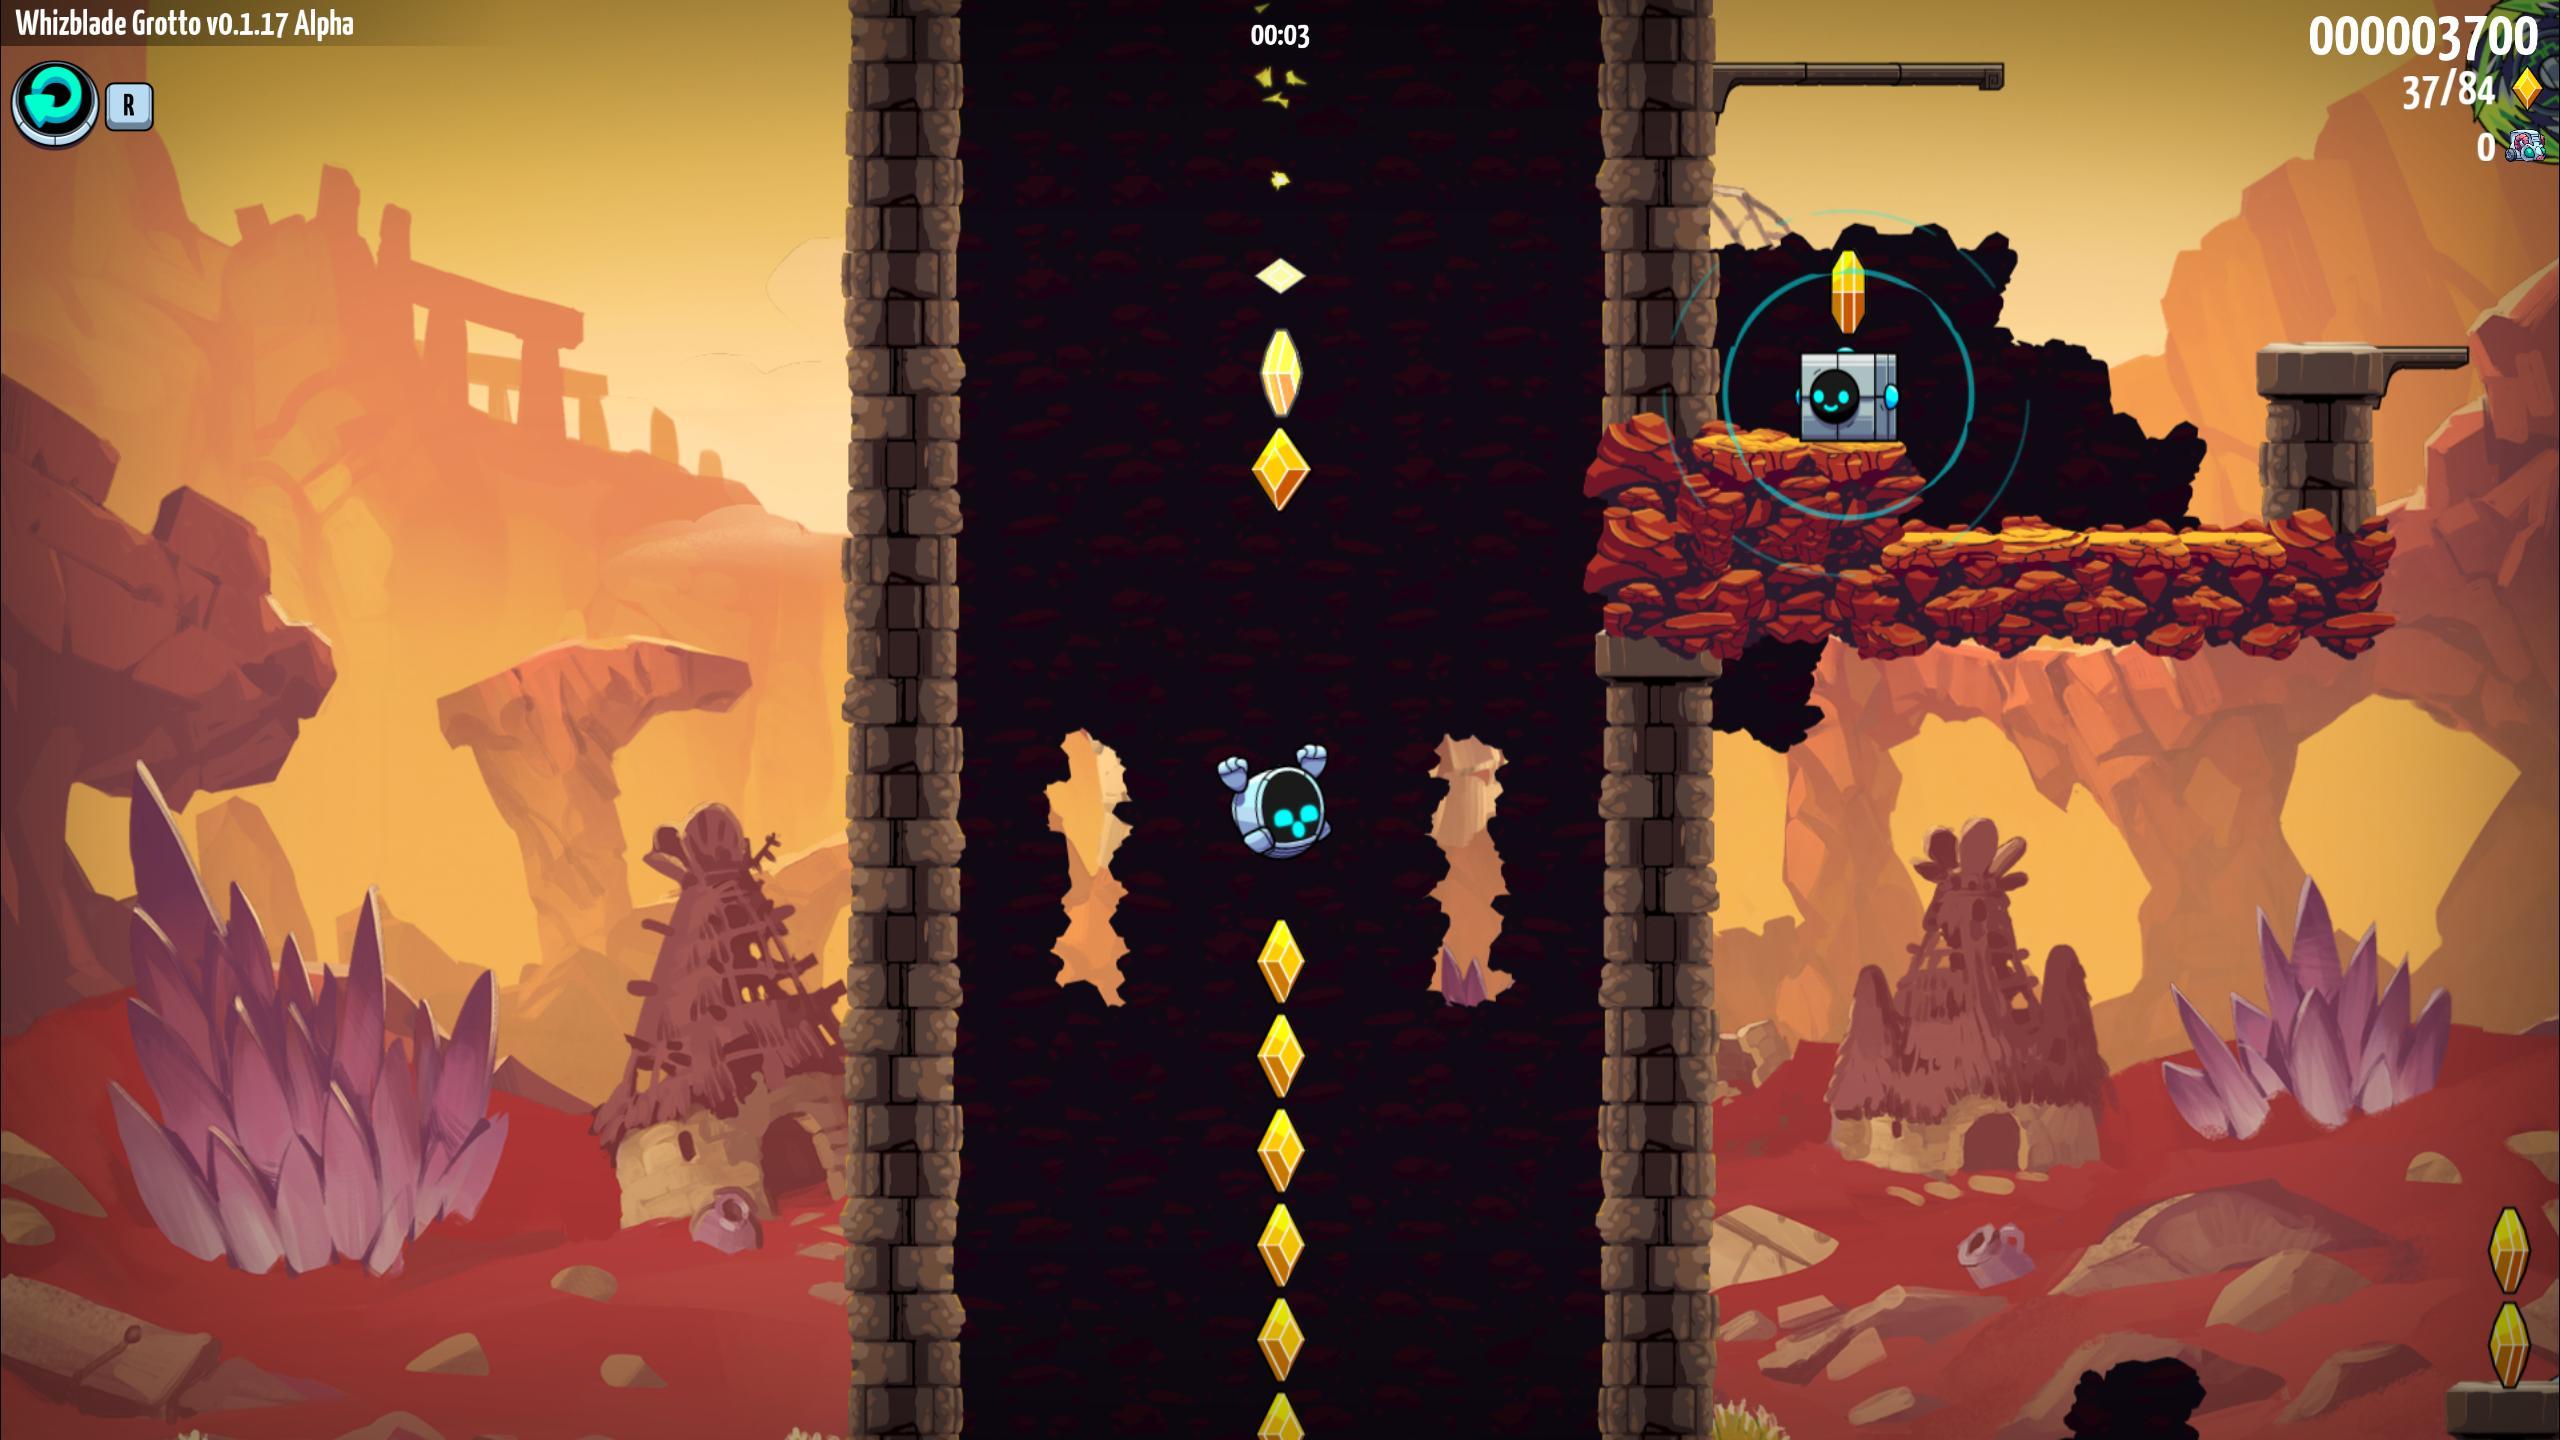 levelhead-el-juego-de-plataformas-de-construccion-de-nivel-cooperativo-se-lanza-a-steam-early-access-hoy-frikigamers.com.jpg